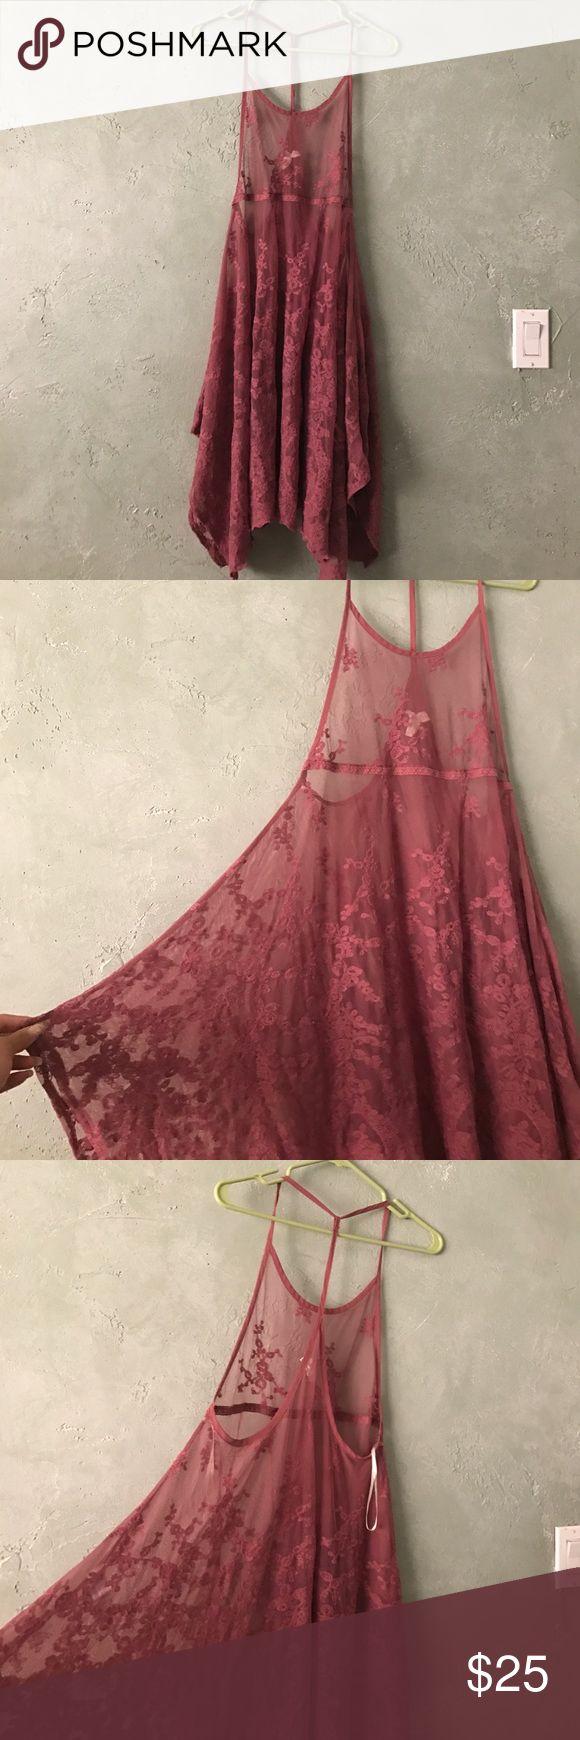 NWOT LACE COACHELLA DRESS Never worn mesh lace Mauve Flowing Midi ✨ Forever 21 Dresses Mini